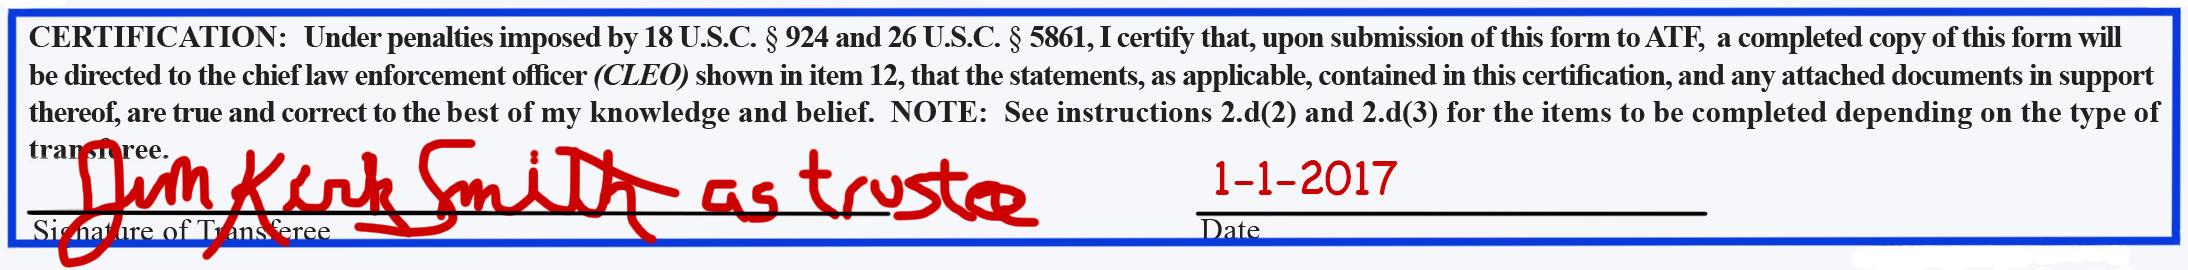 Form 4 Certification